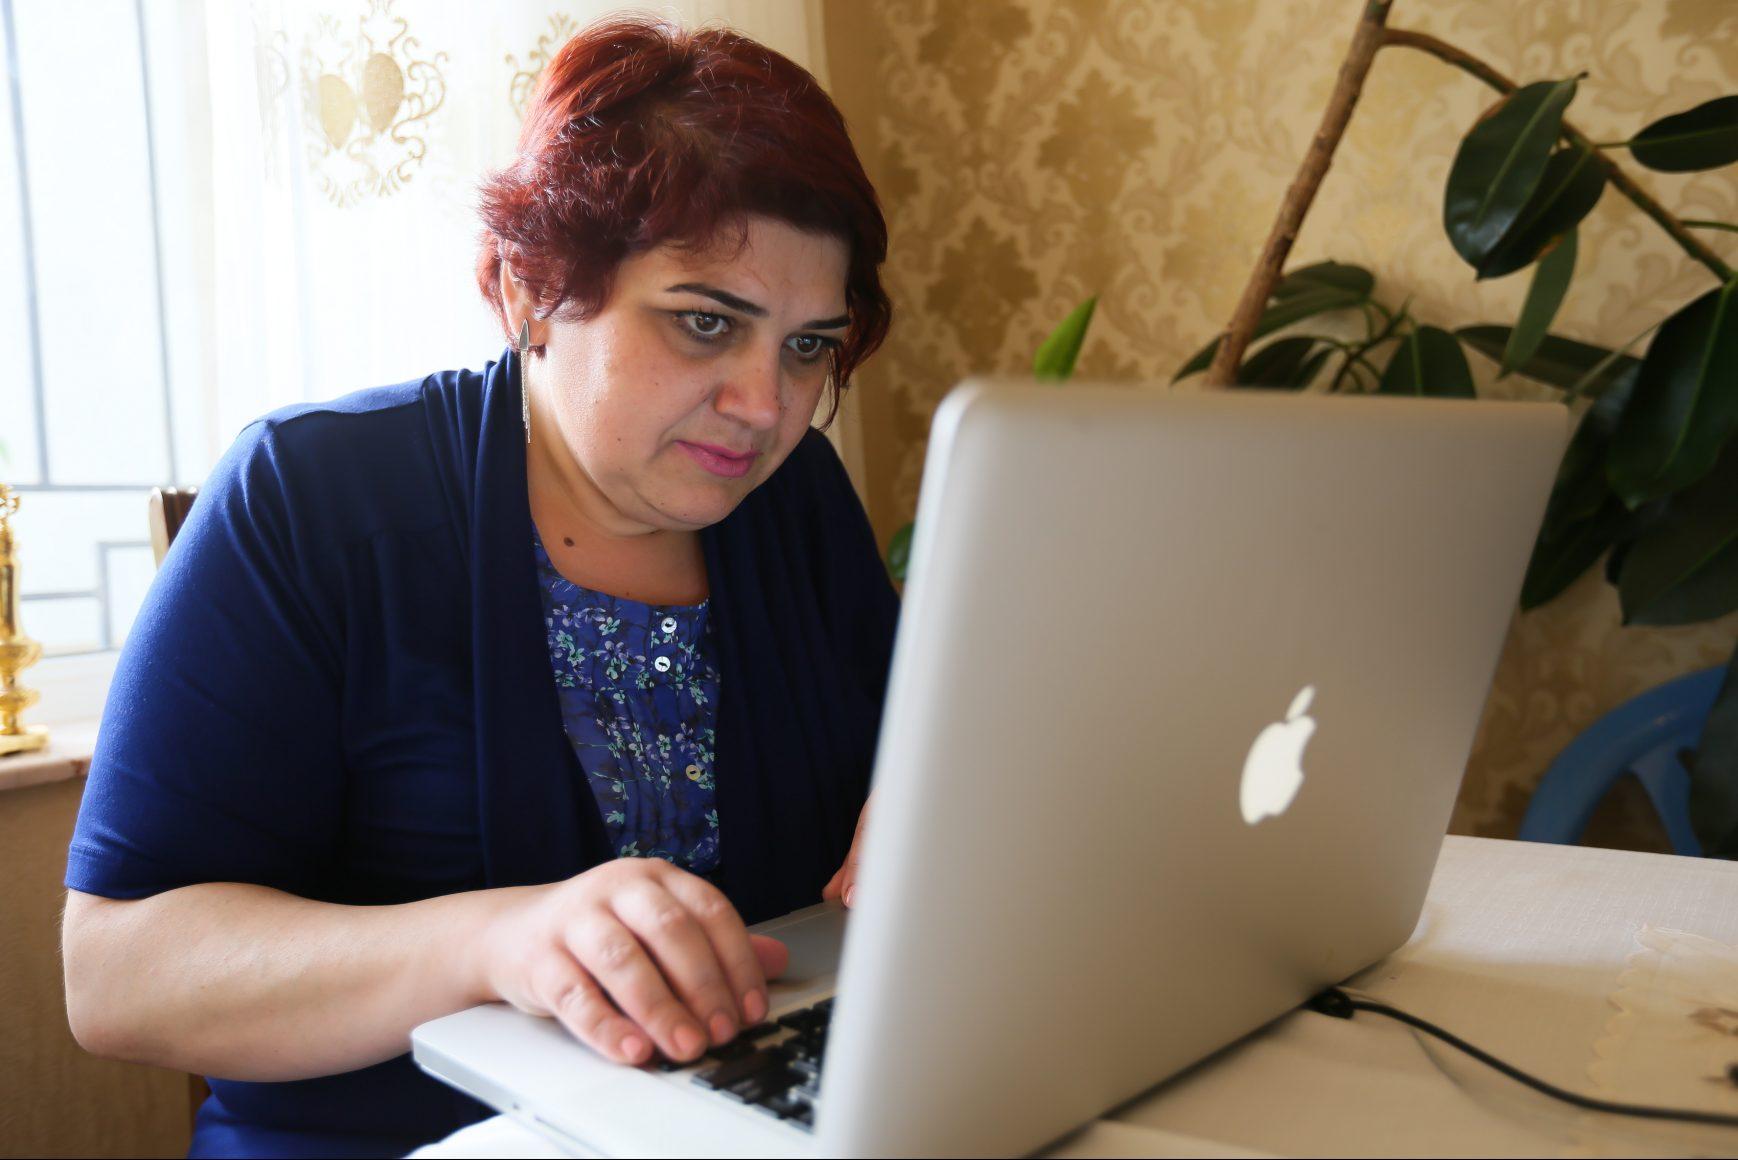 Khadija Ismayilova sits at a computer